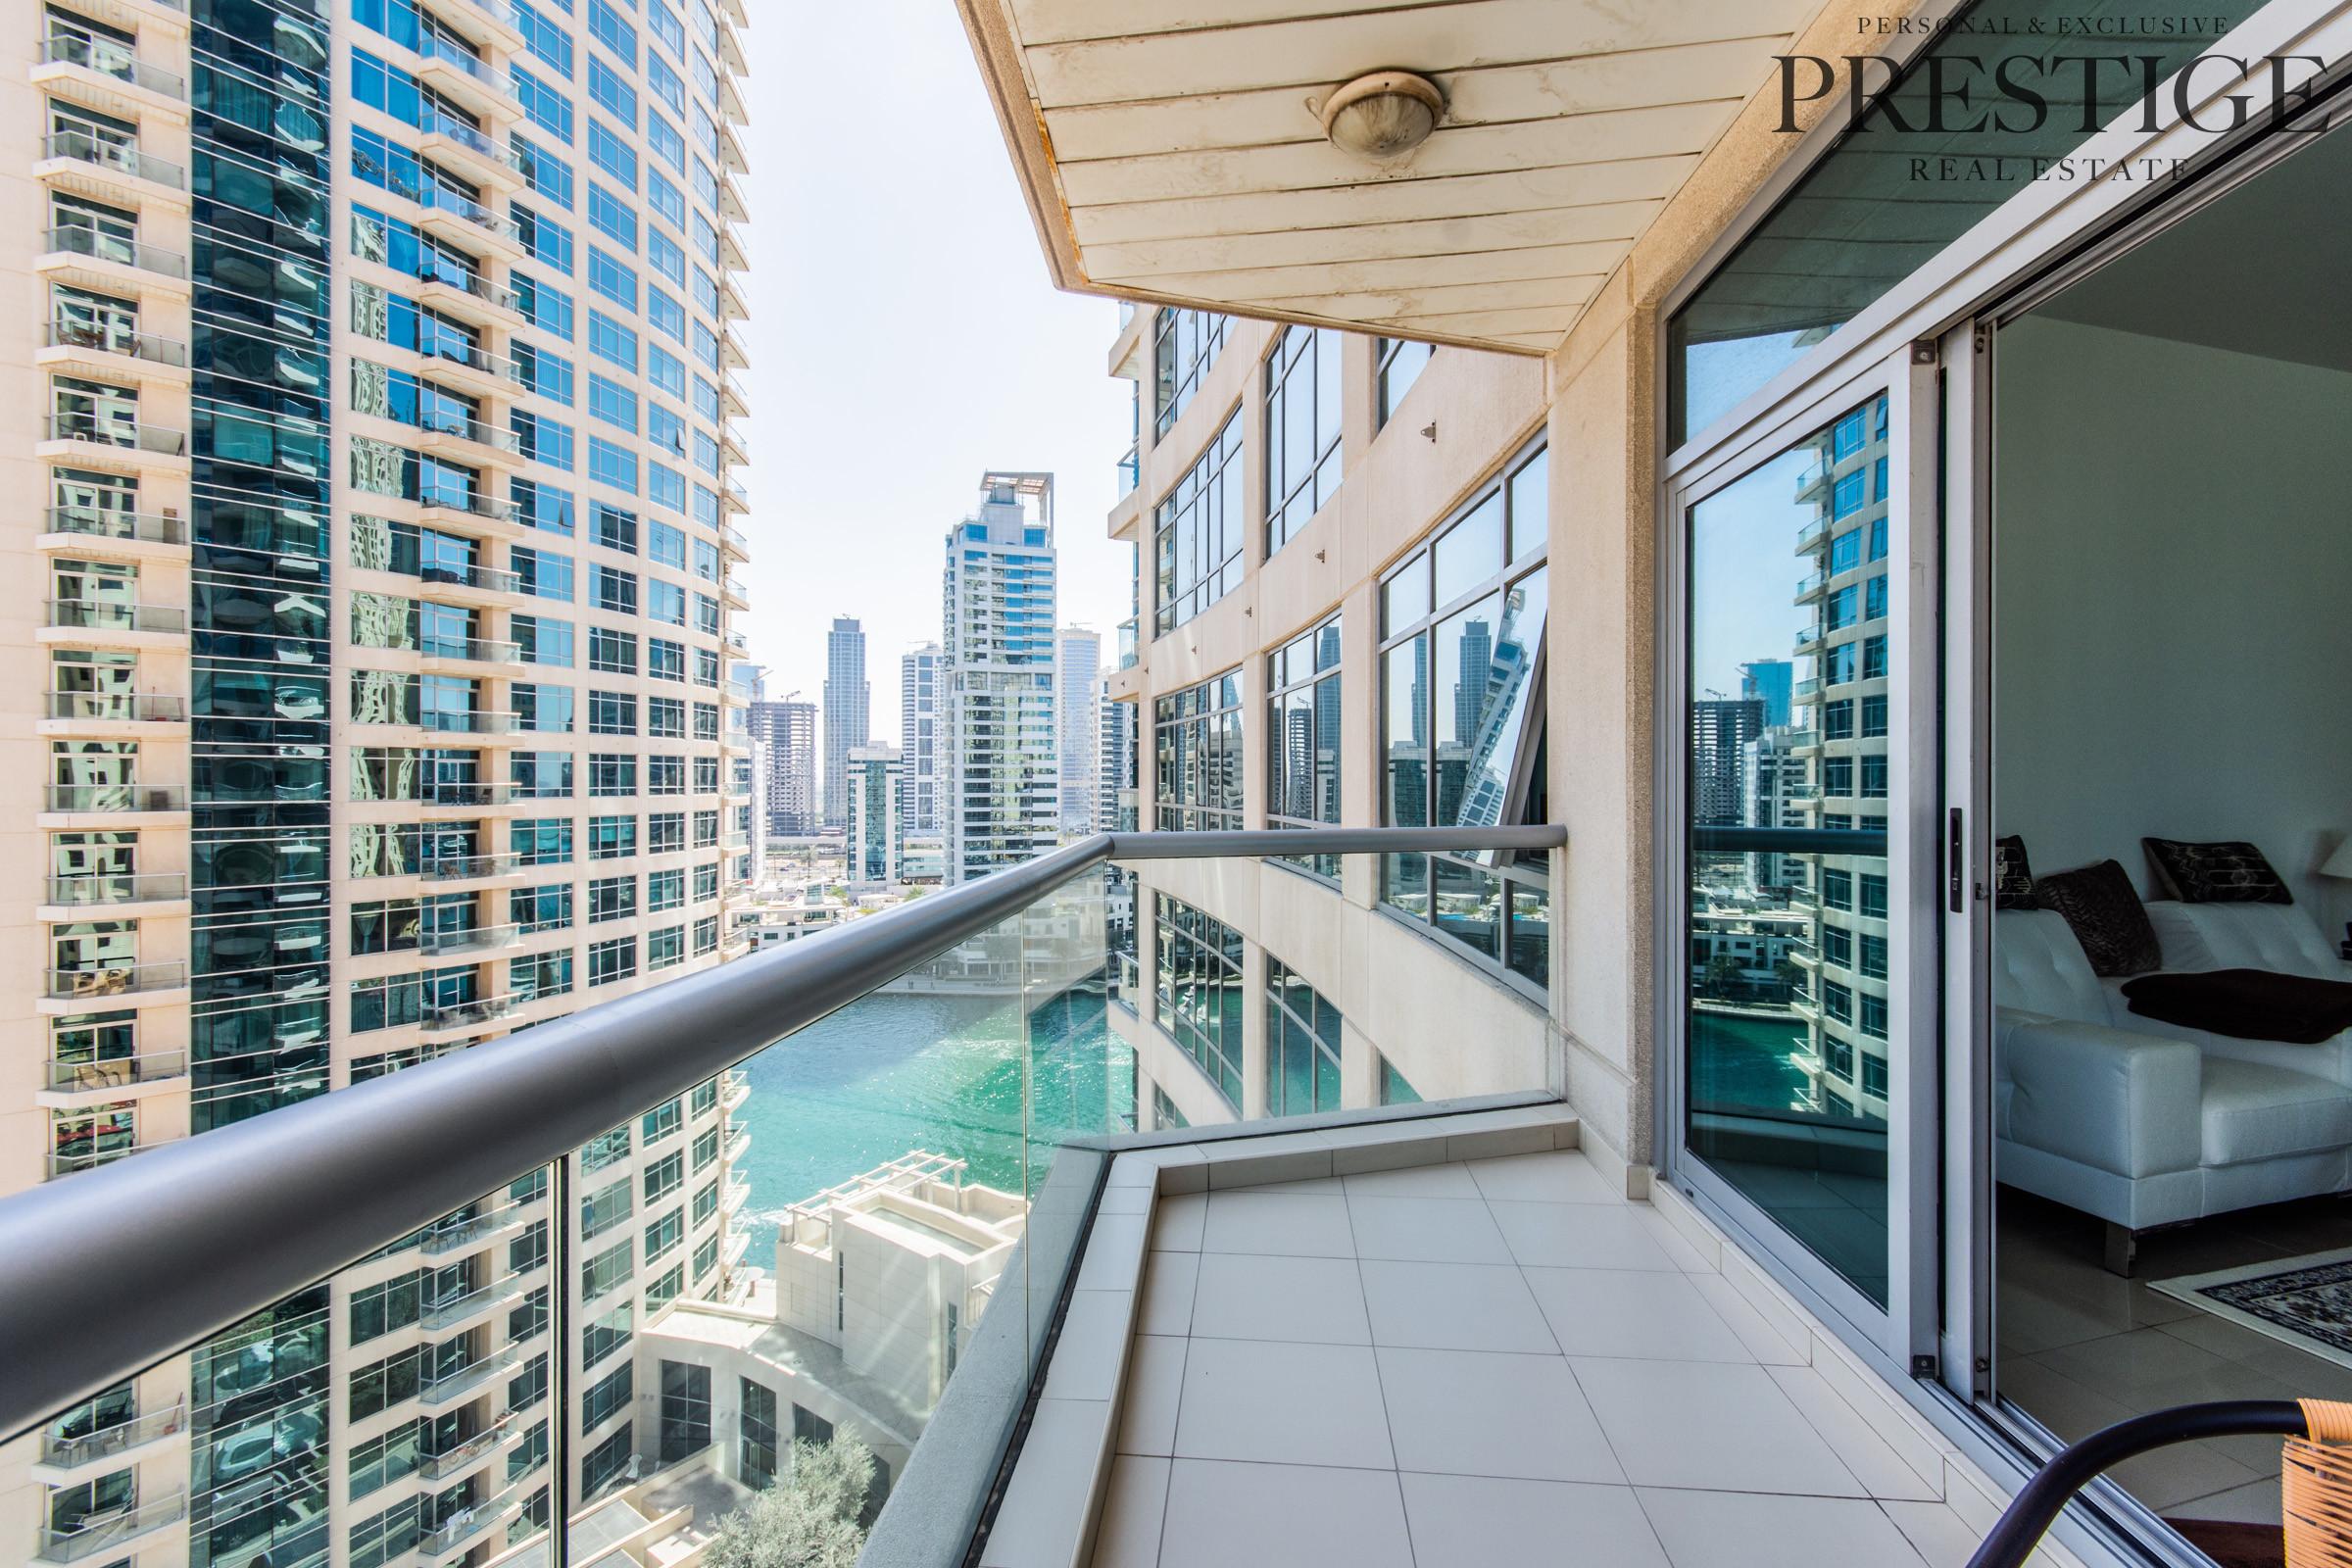 one-bedroom-apartment-sale-sanibel-tower